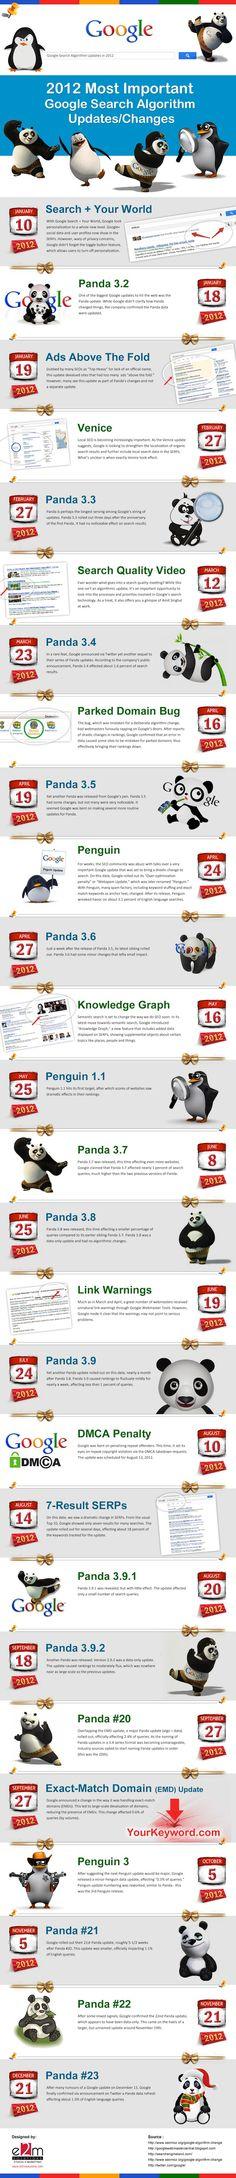 2012 most important Google search algorithm updates/changes